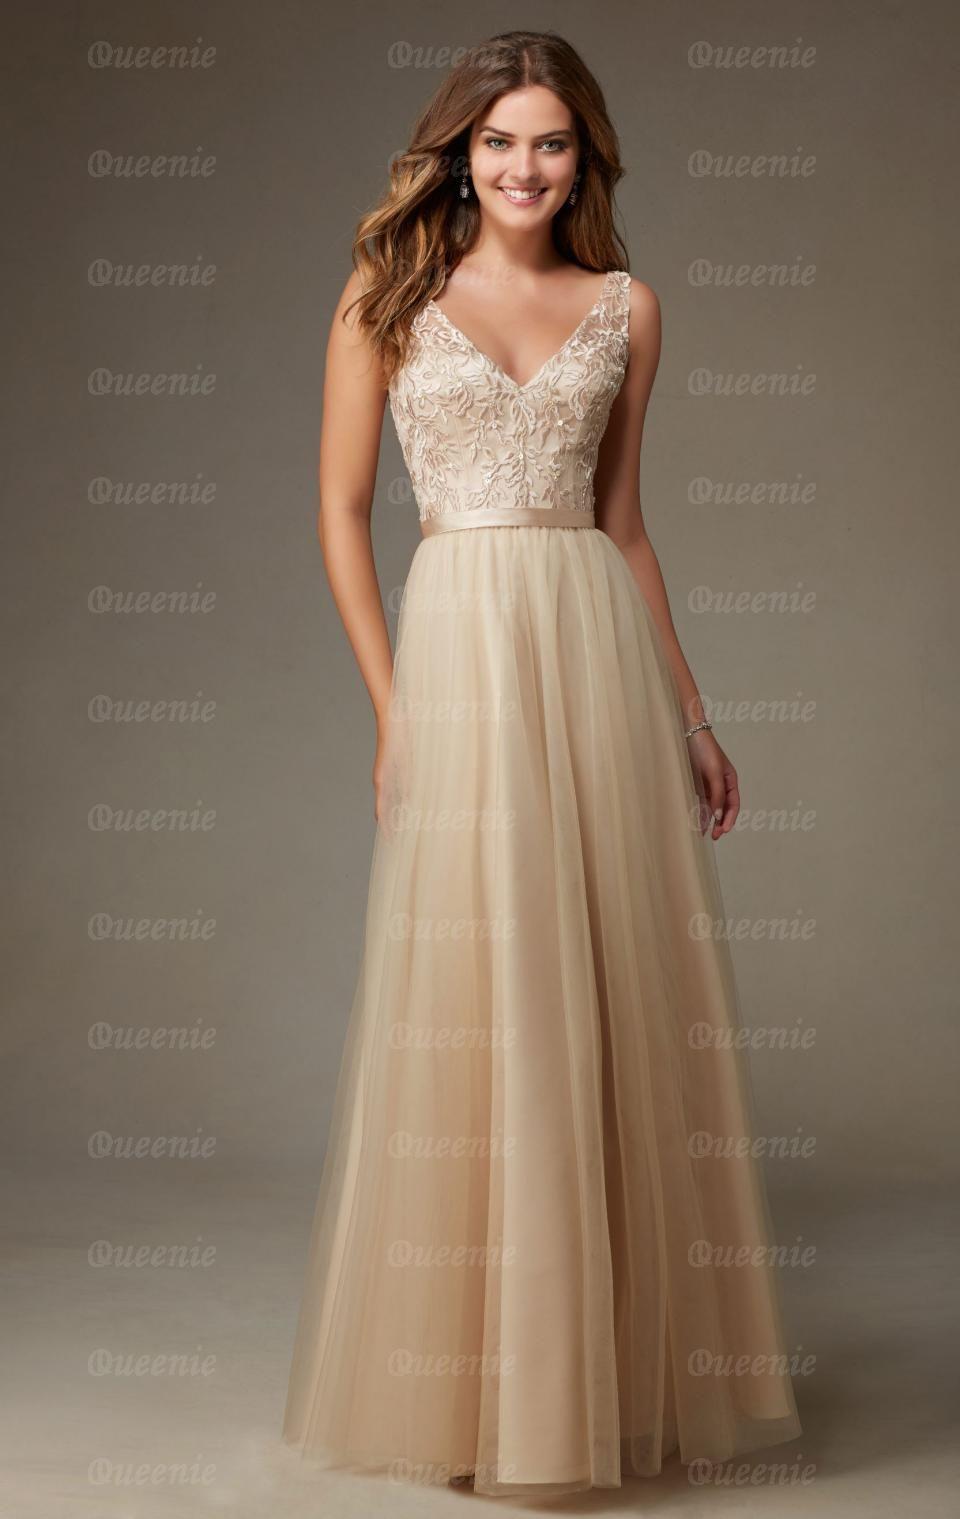 Stunning champagne bridesmaid dress bnncl0010 bridesmaid uk stunning champagne bridesmaid dress bnncl0010 bridesmaid uk ombrellifo Images